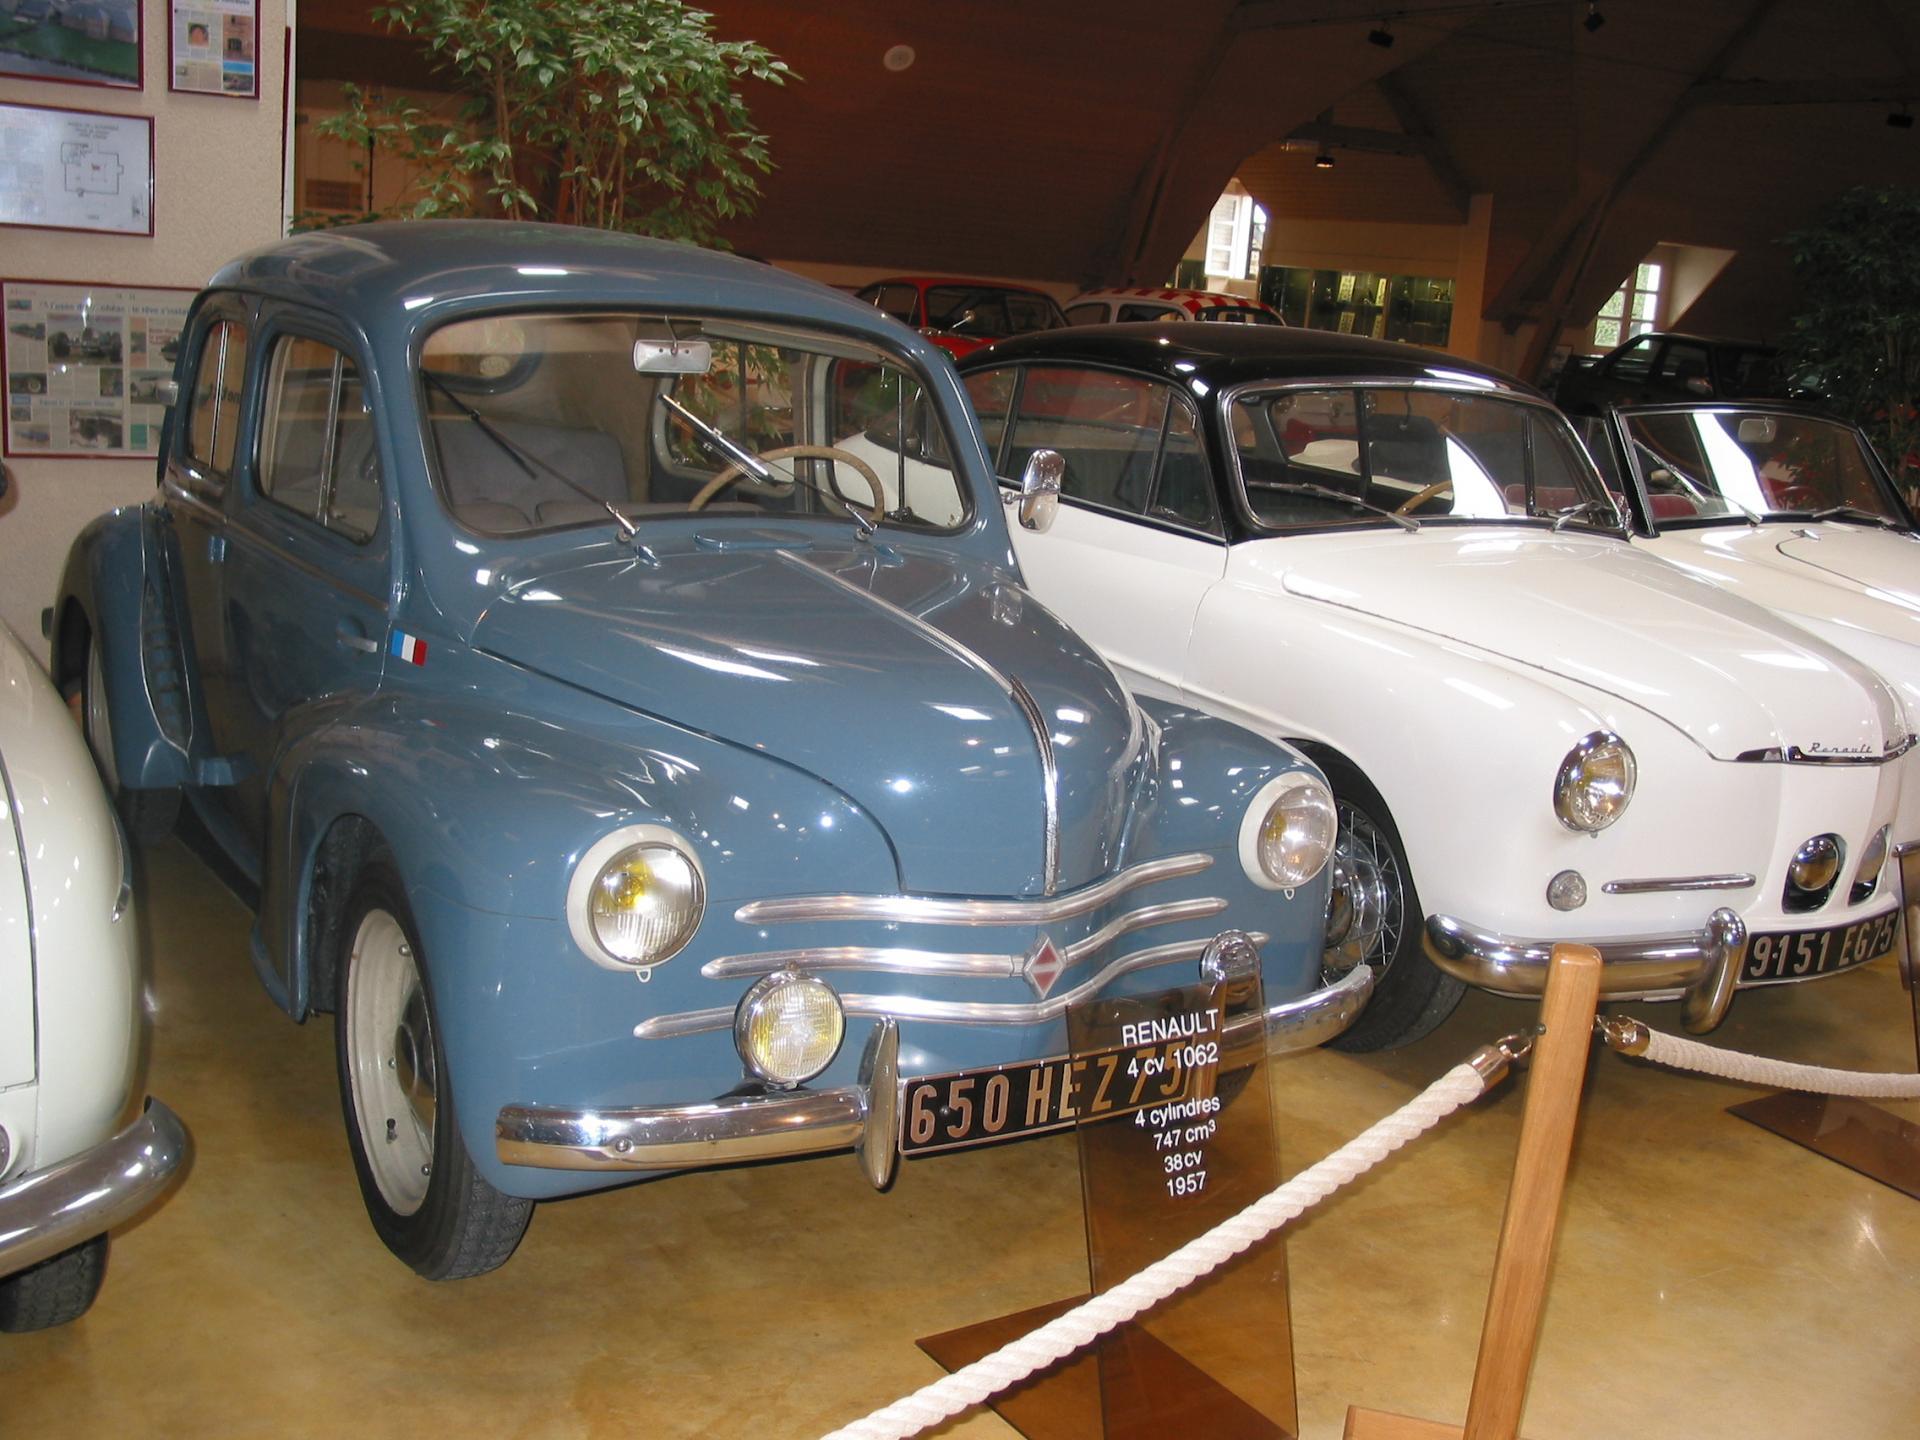 Musée automobile de Lohéac